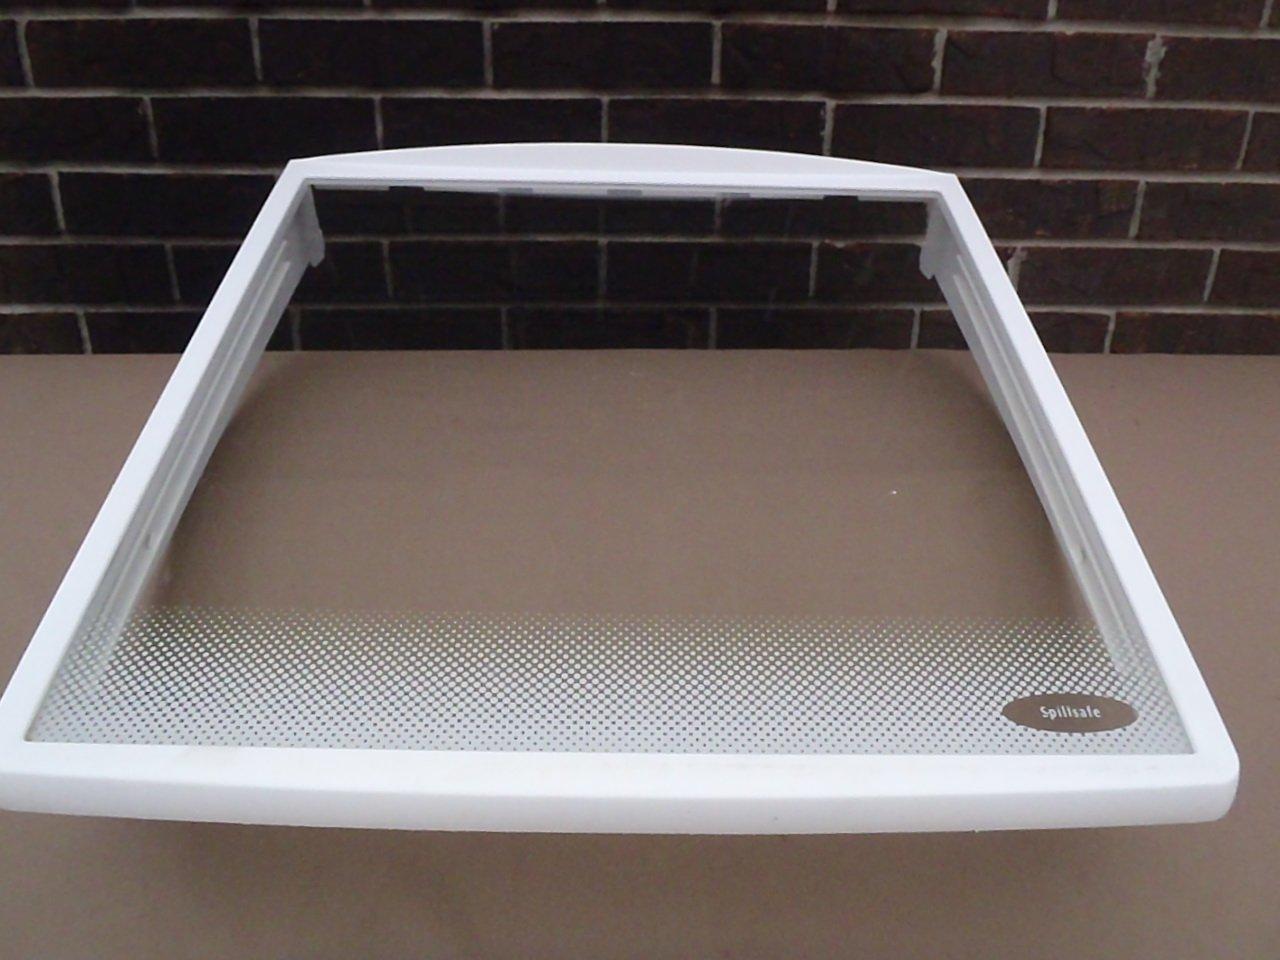 Frigidaire Spill Safe Replacement Glass Shelf